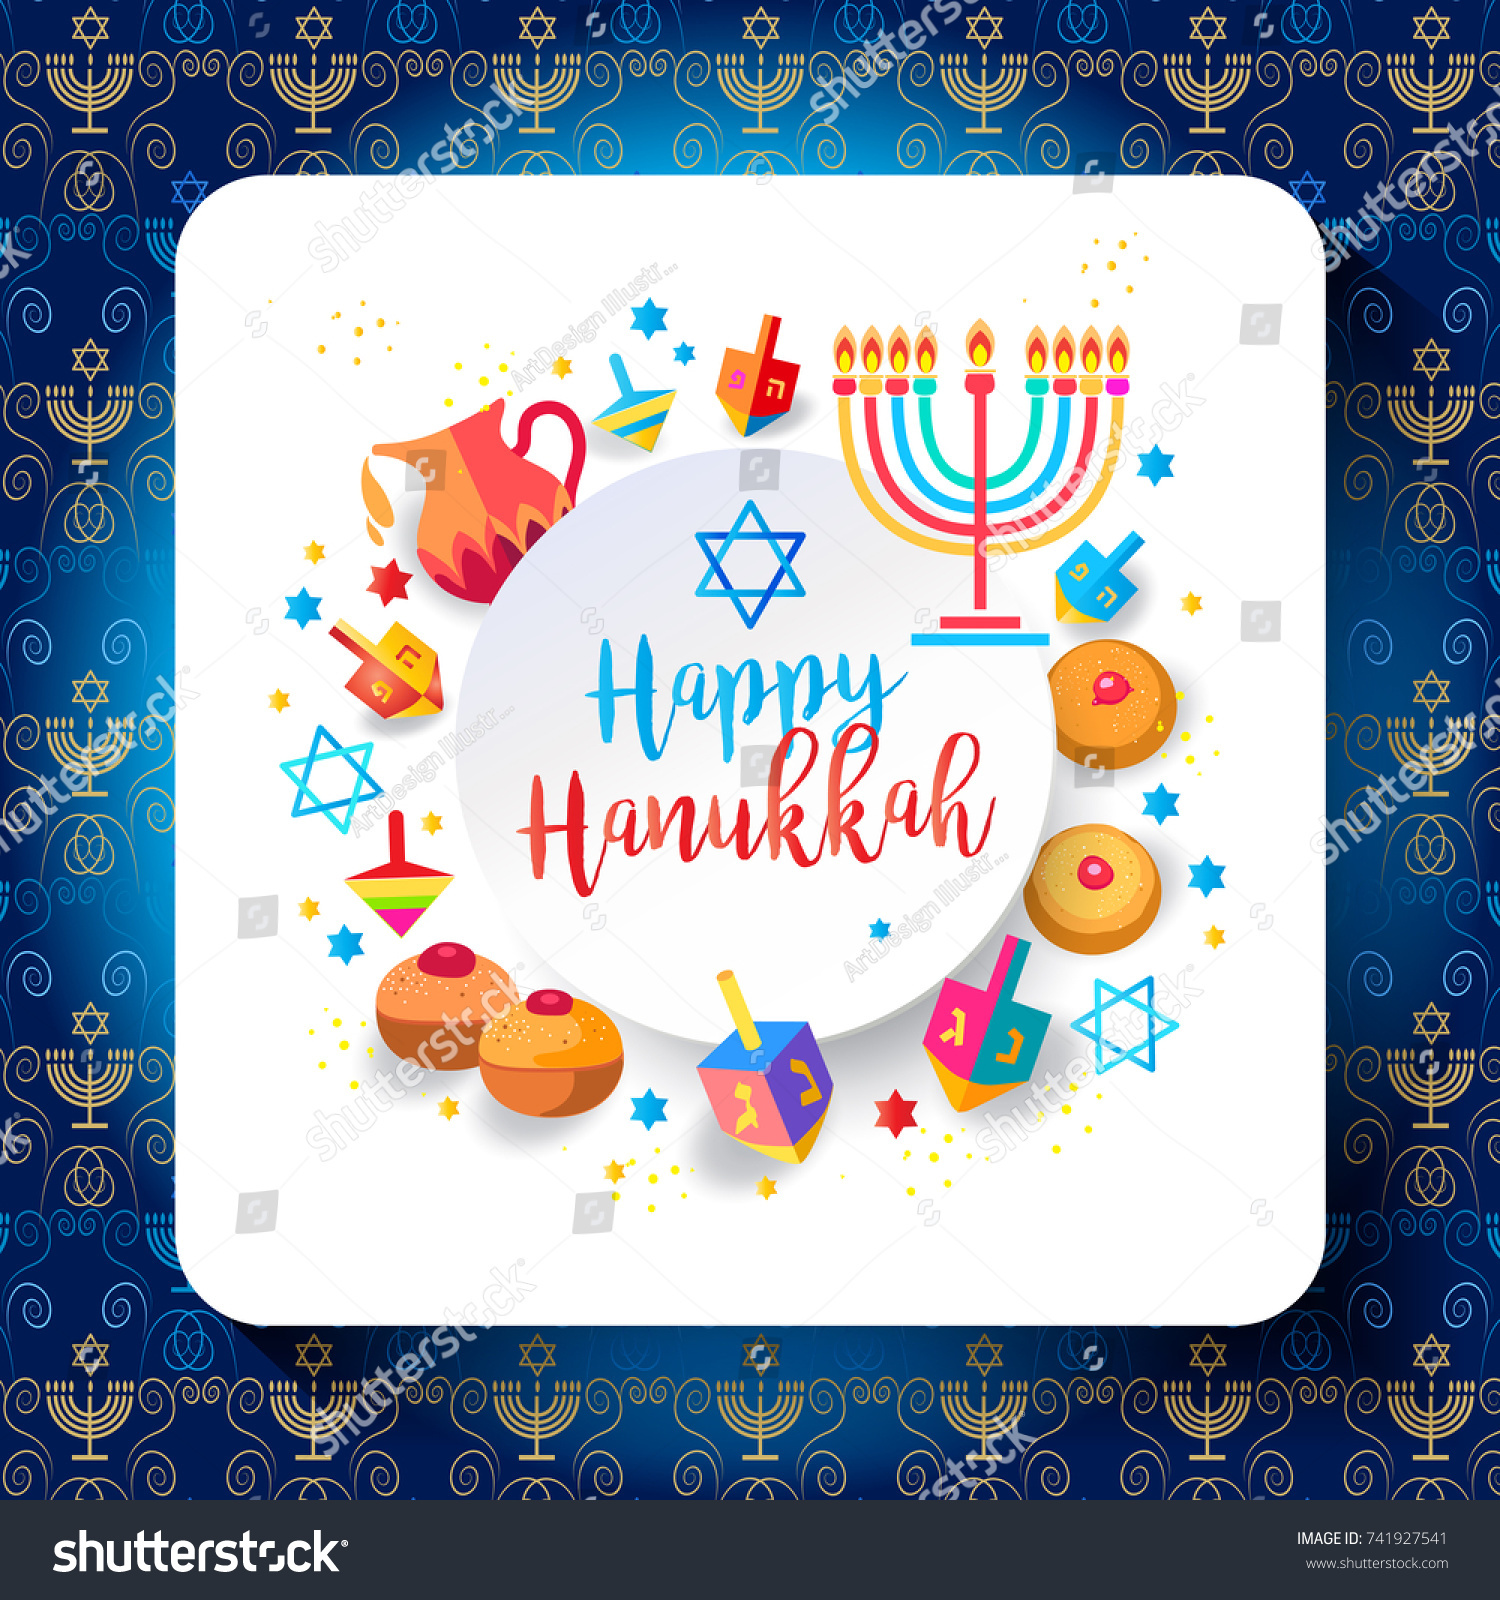 Jewish holiday hanukkah greeting card traditional stock vector jewish holiday hanukkah greeting card traditional chanukah symbols wooden dreidels spinning top kristyandbryce Images